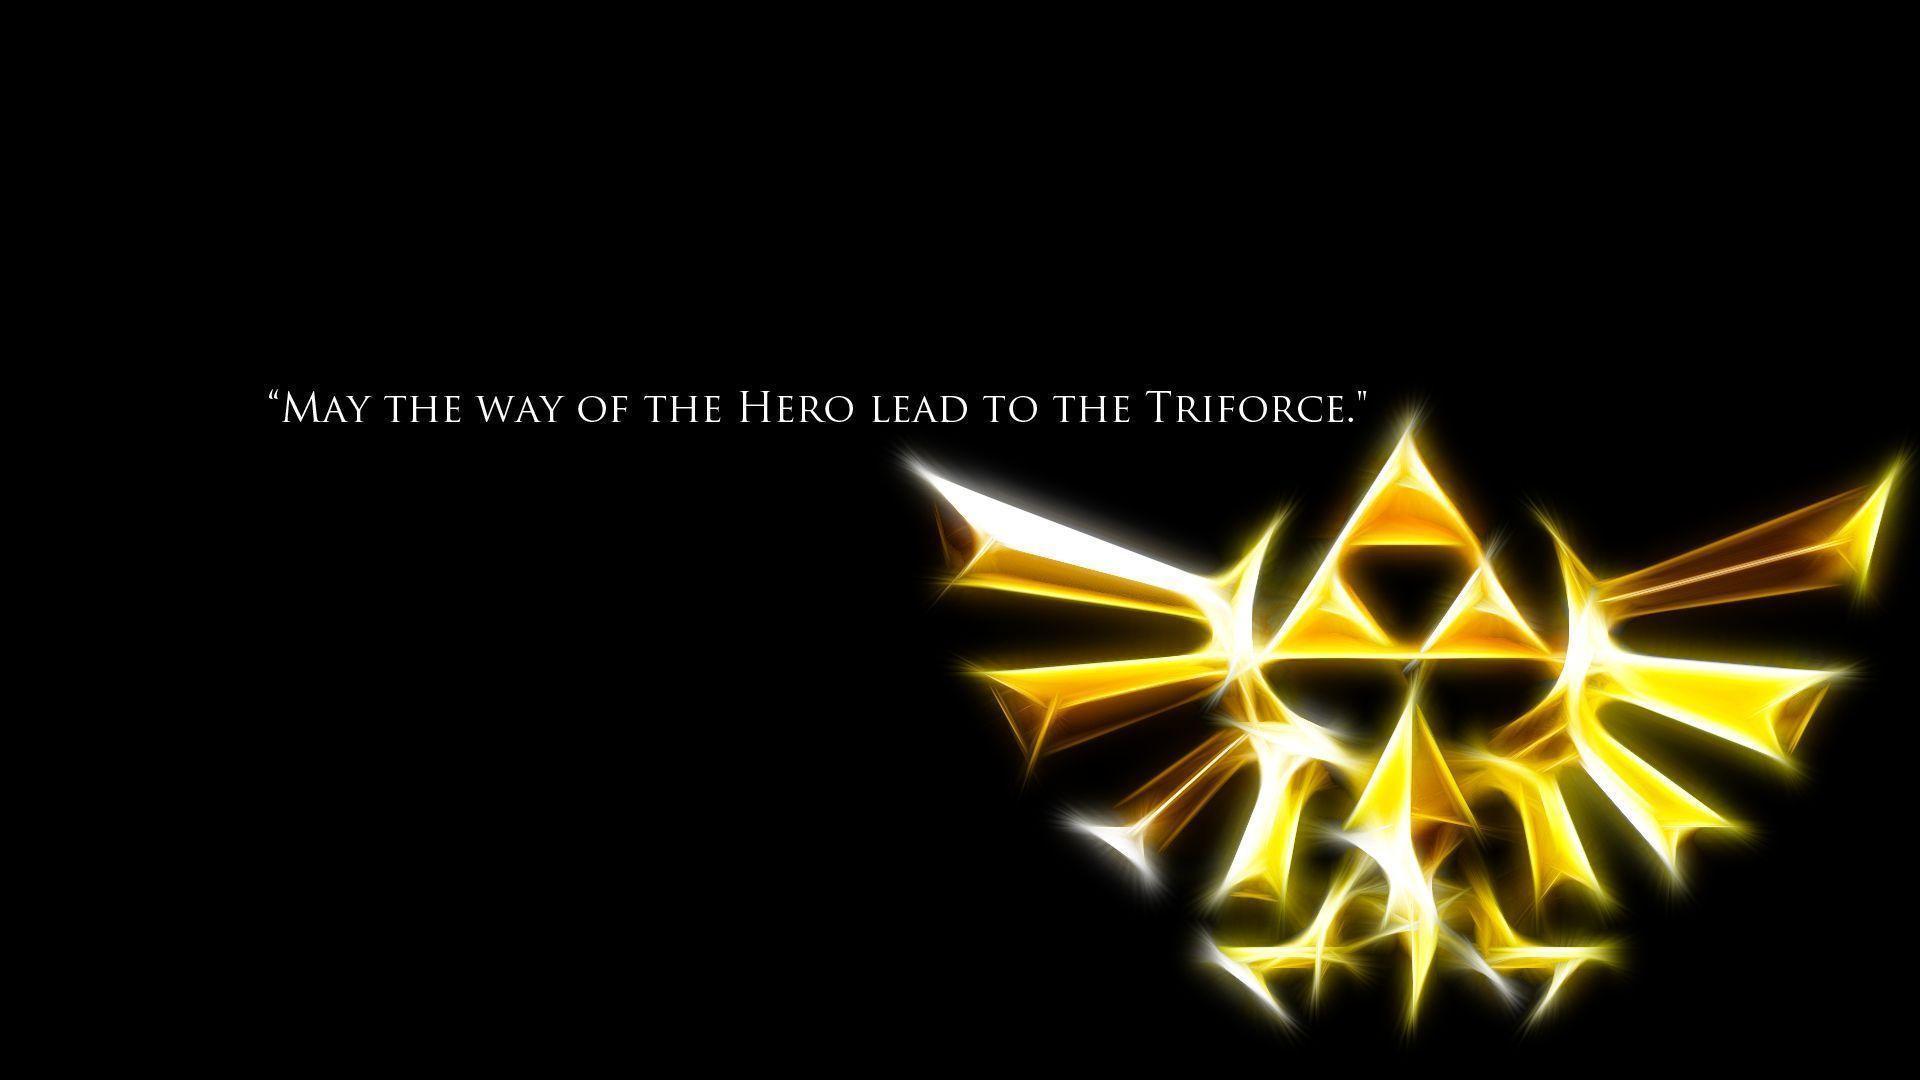 Zelda Wallpaper 1920x1080 Triforce Zelda Triforce Wallpap...